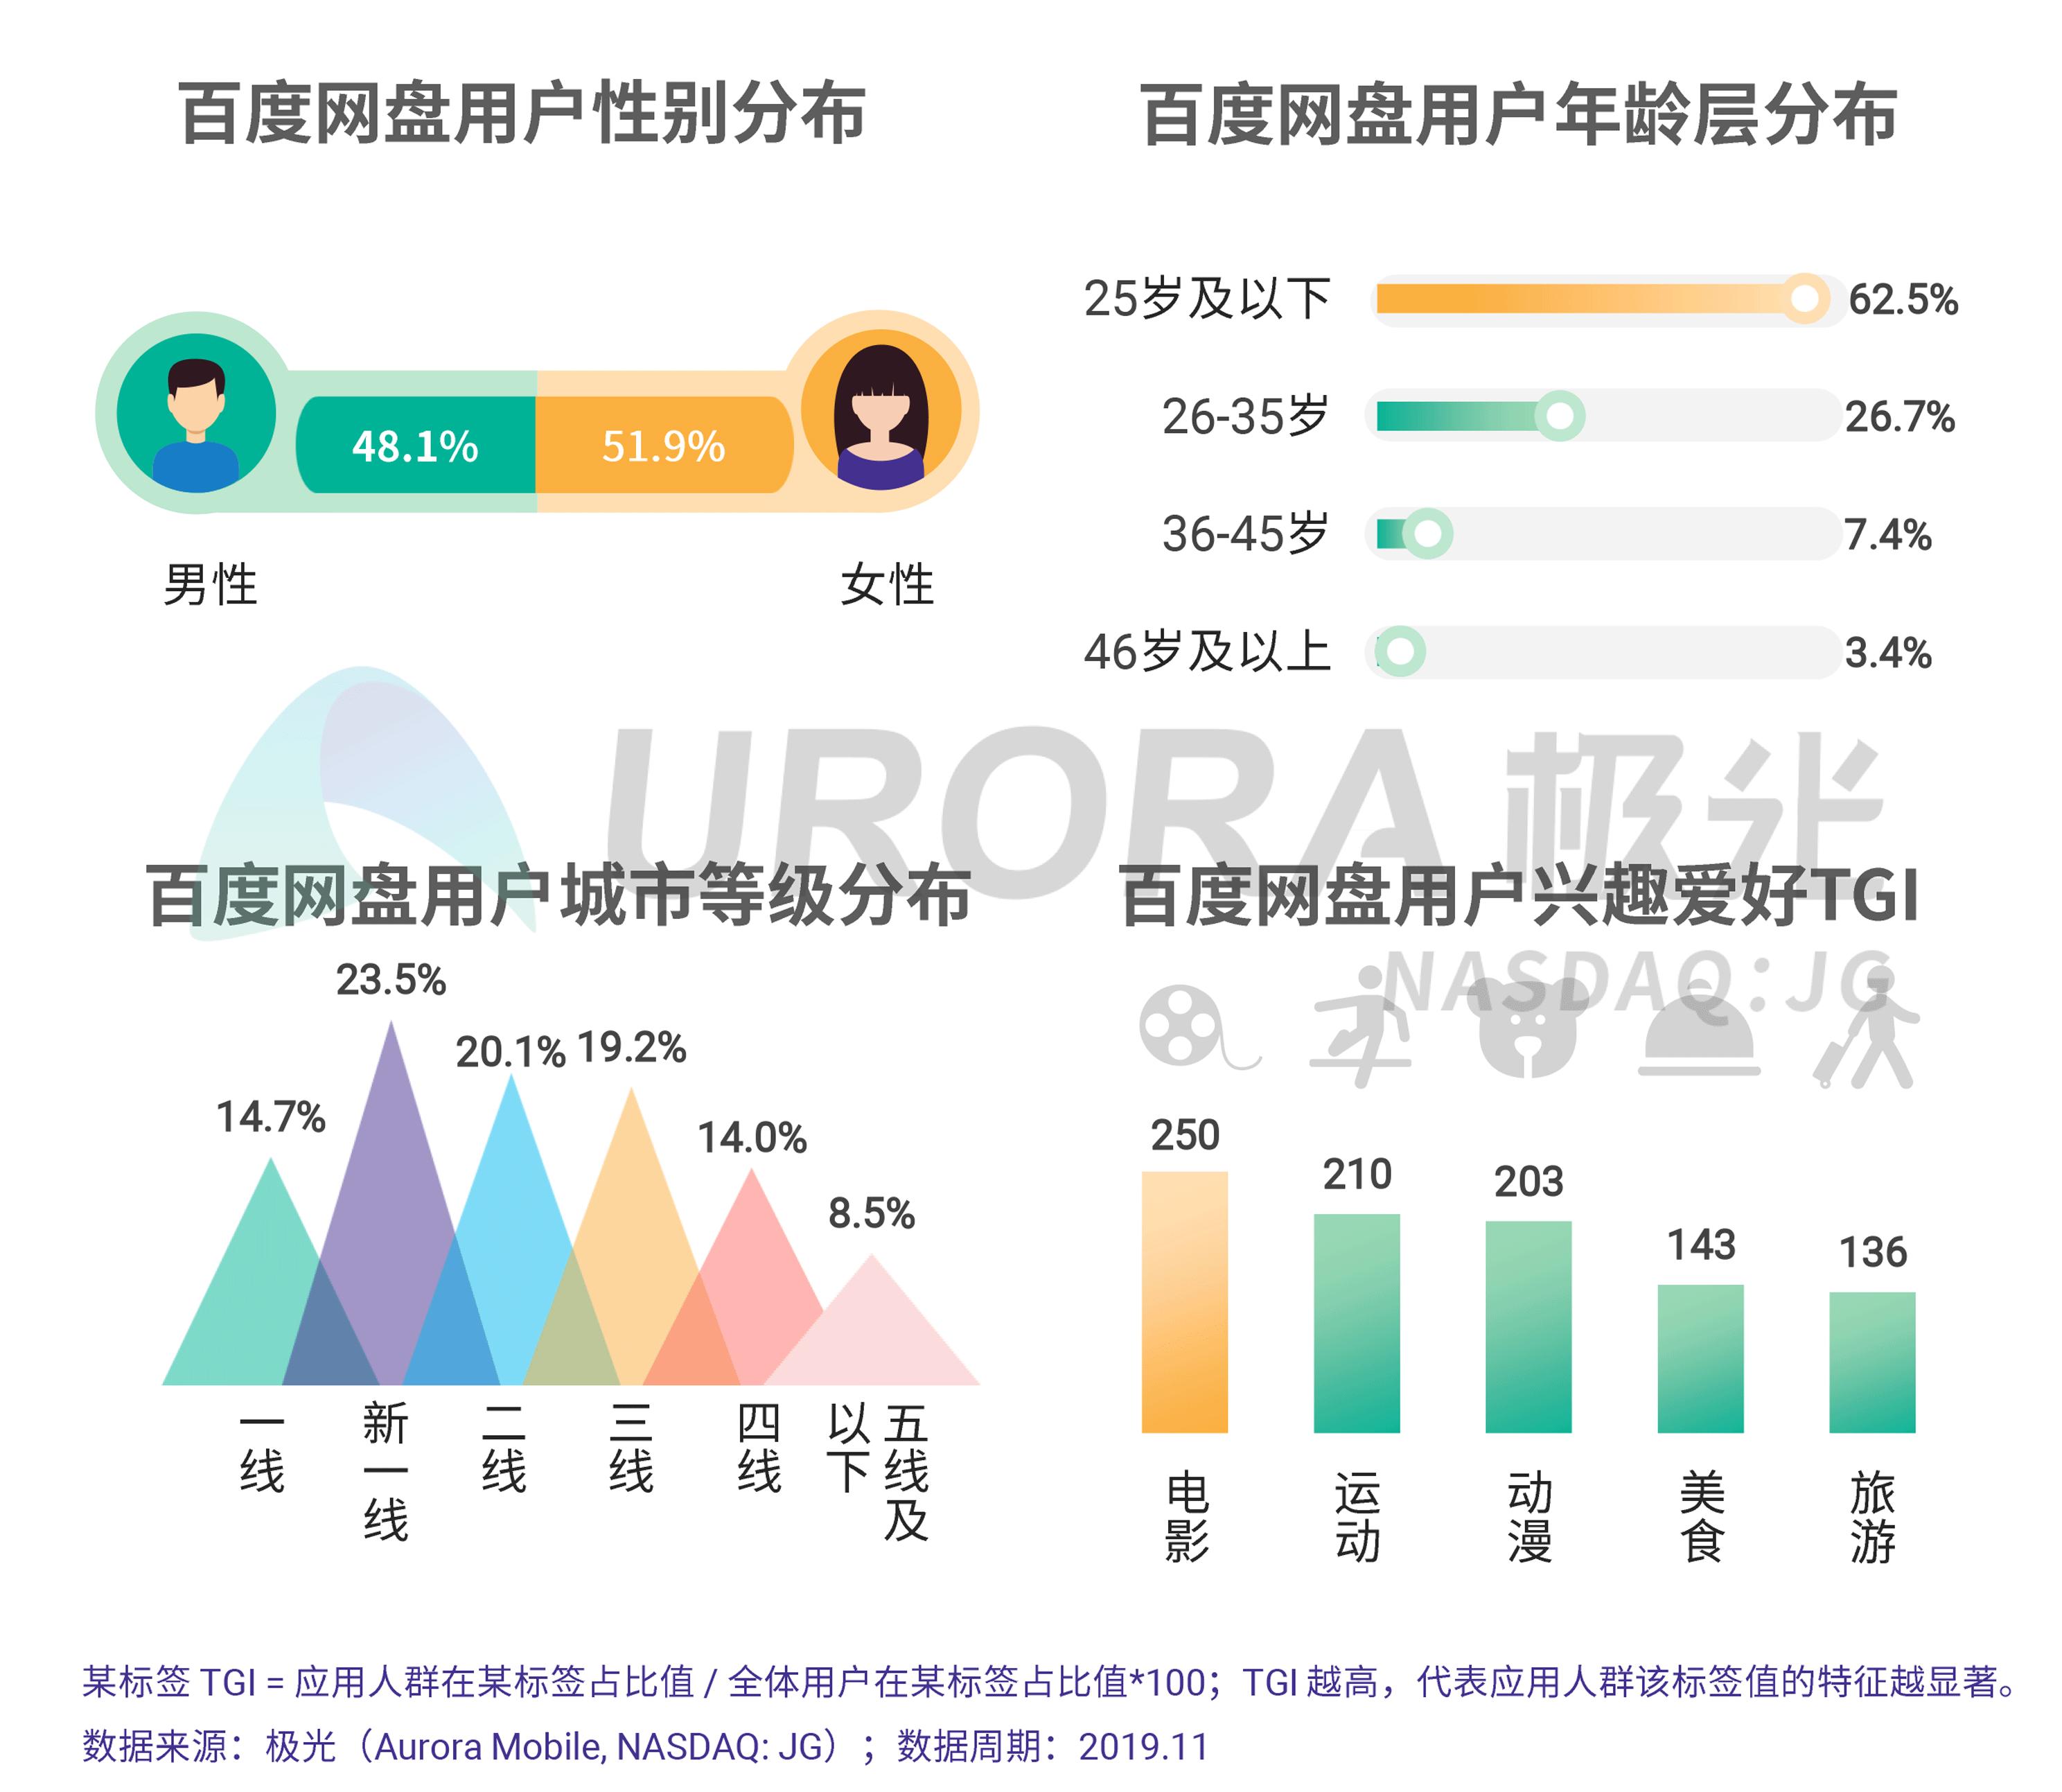 JIGUANG-个人网盘行业研究报告-final---切图版2-20.png